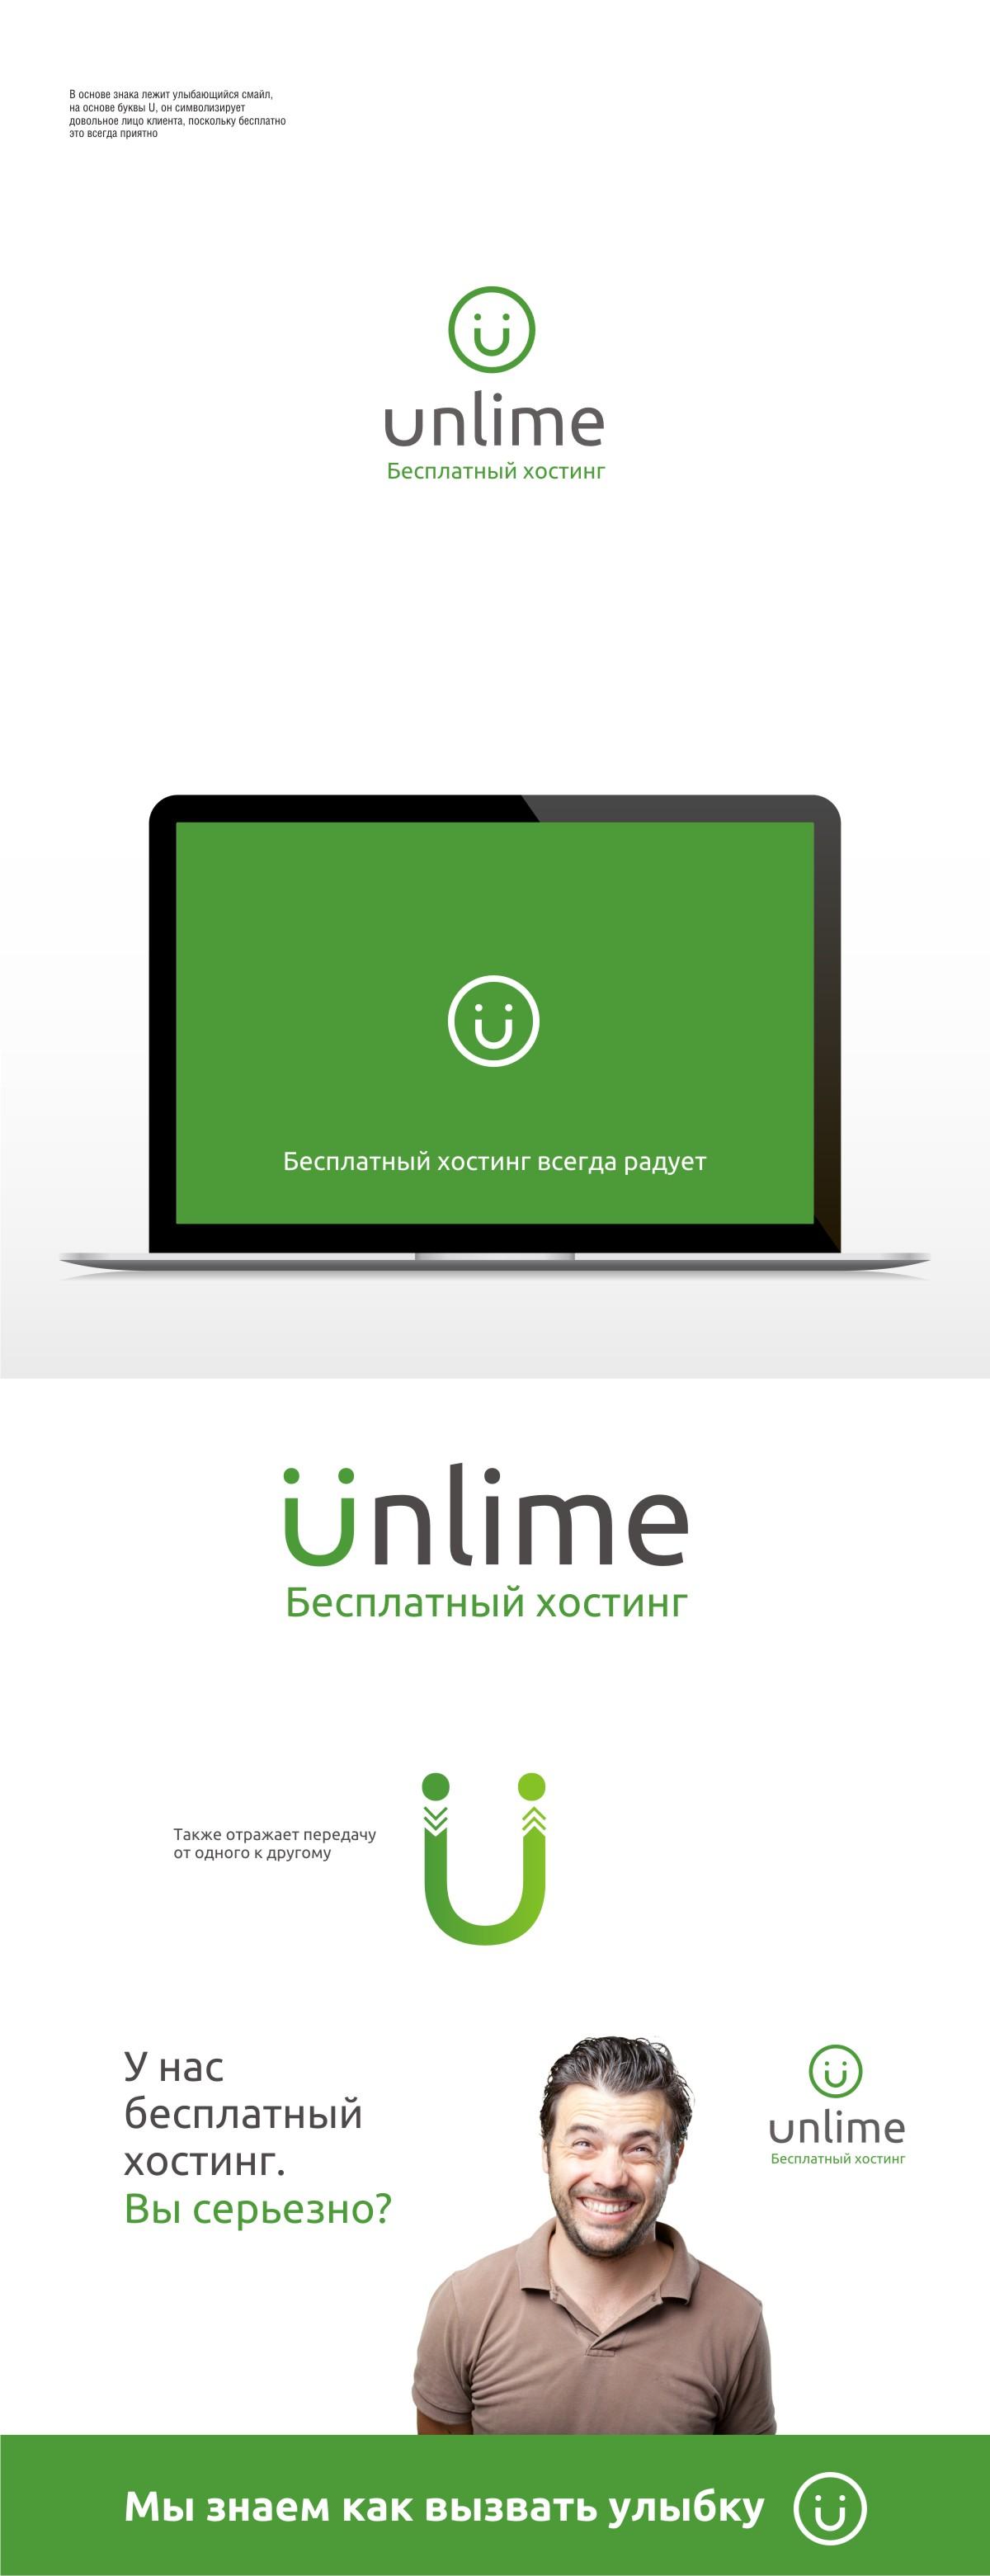 Разработка логотипа и фирменного стиля фото f_2825948bd96db231.jpg